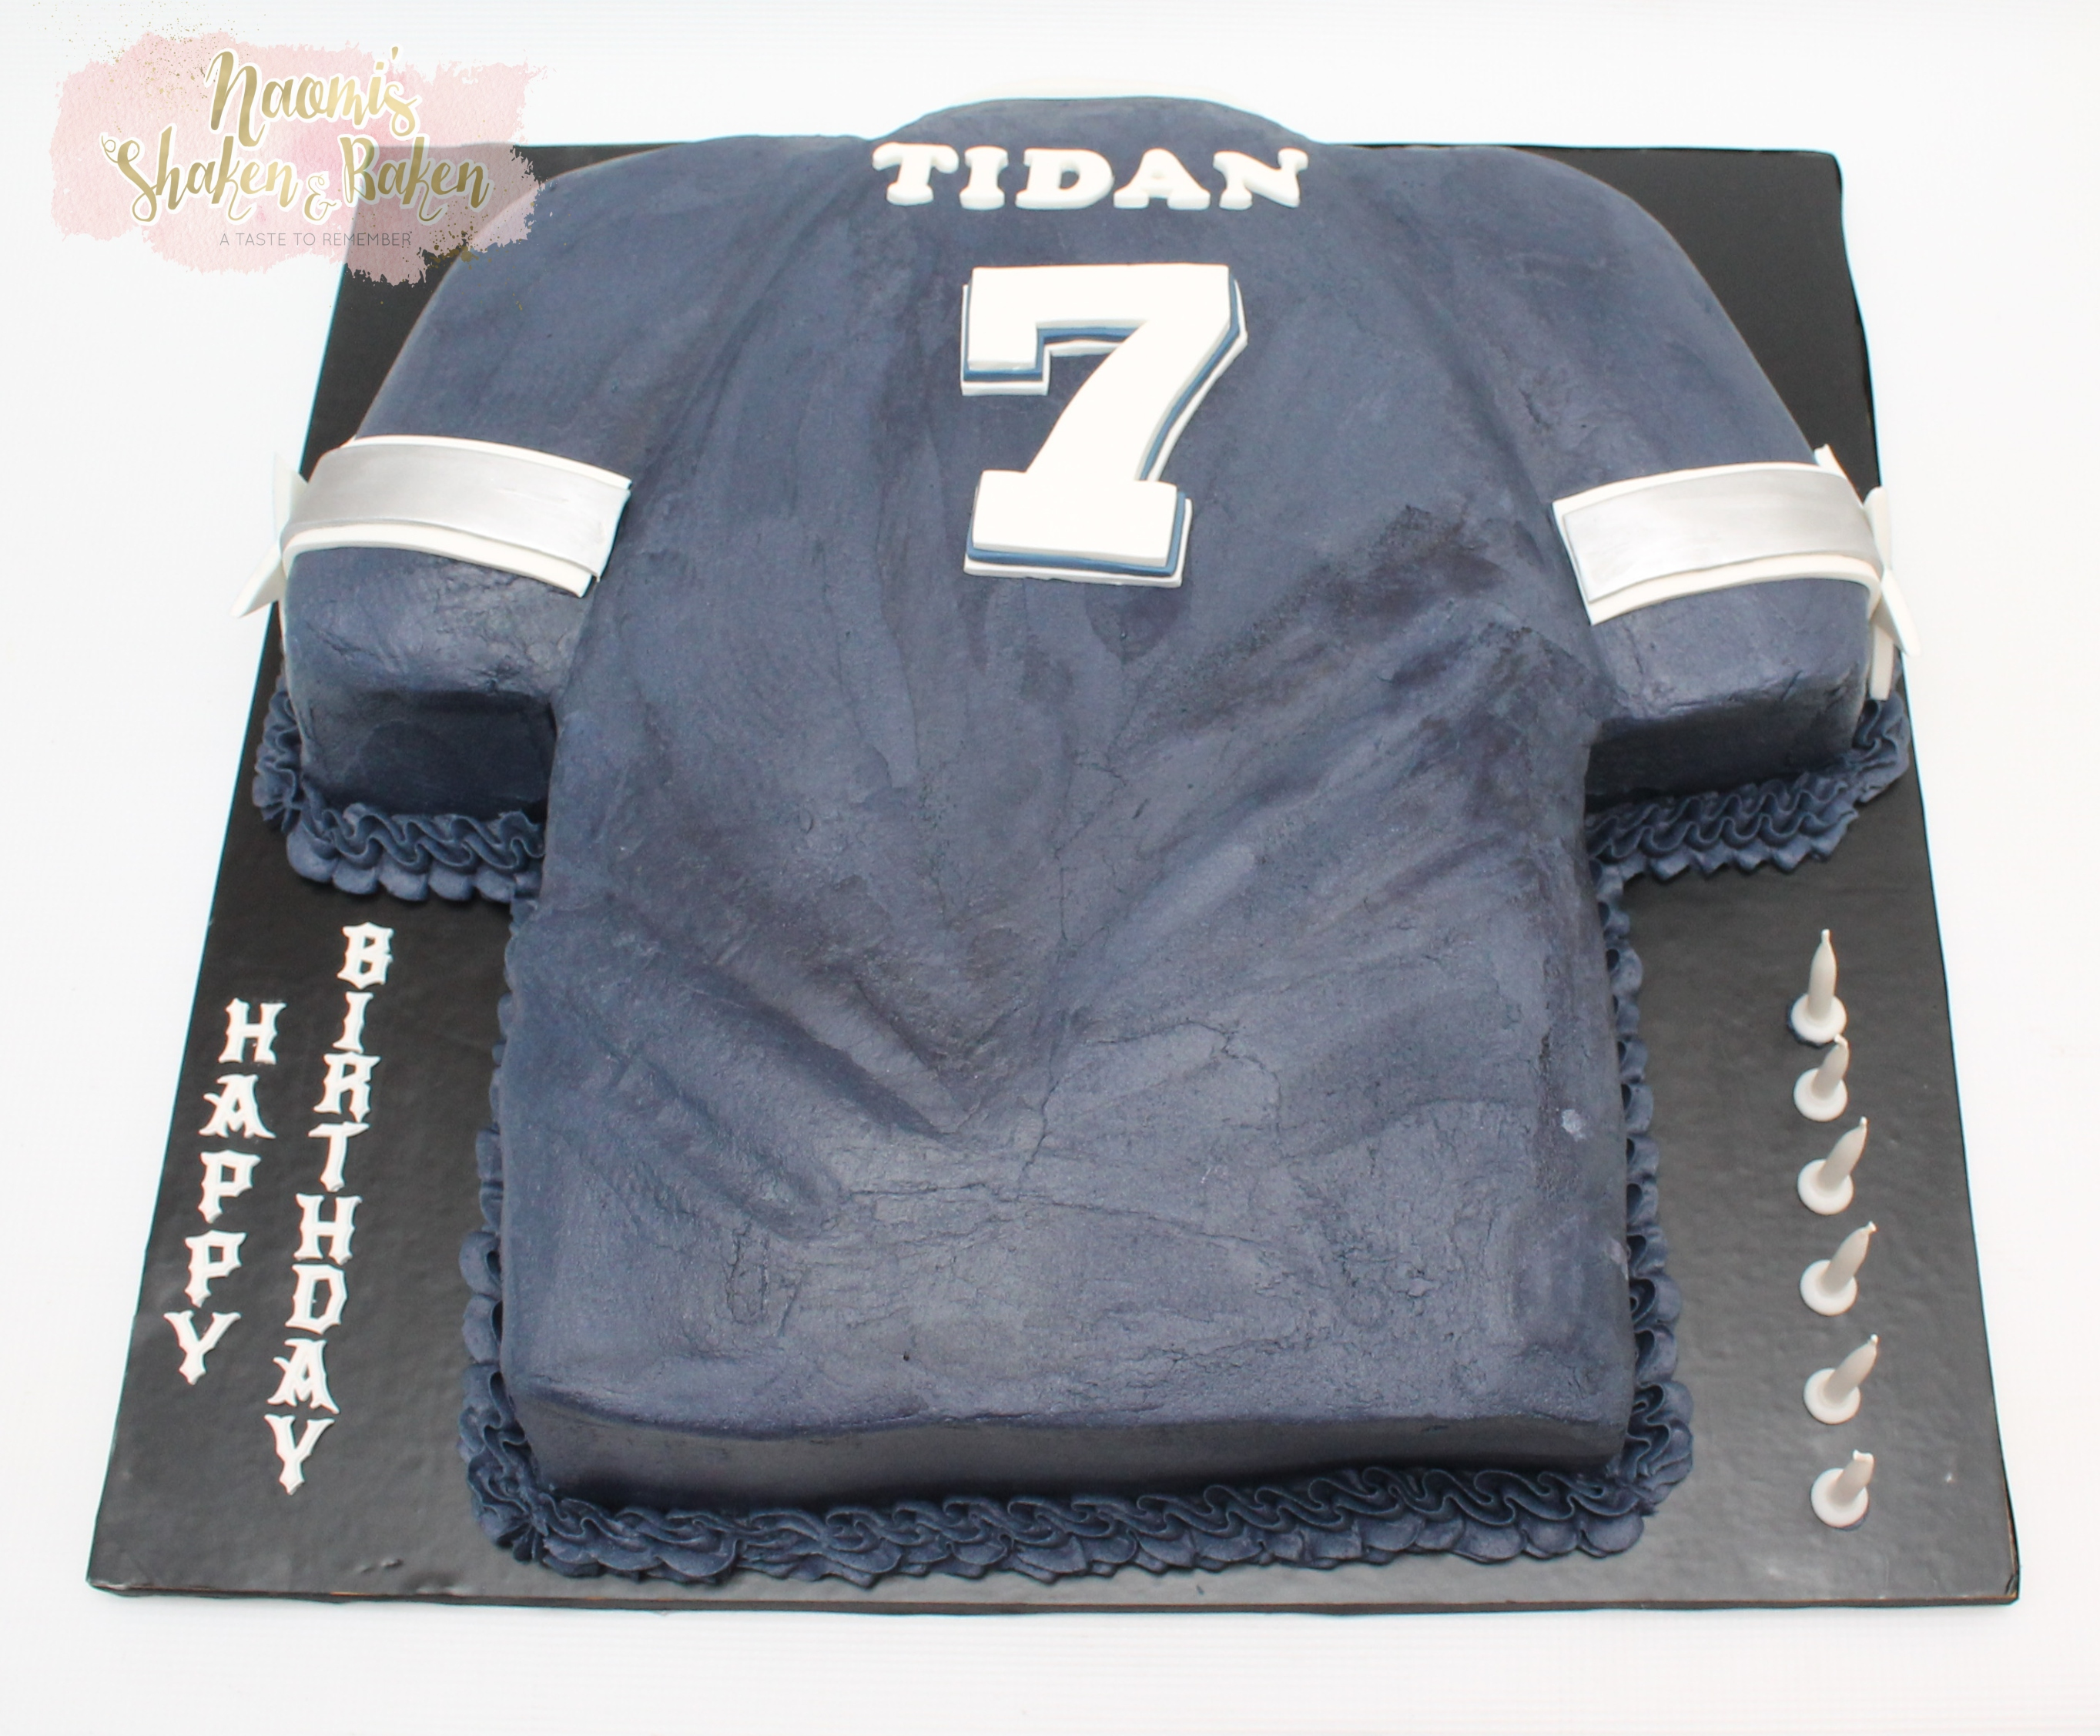 Cowboy's football jersey cake